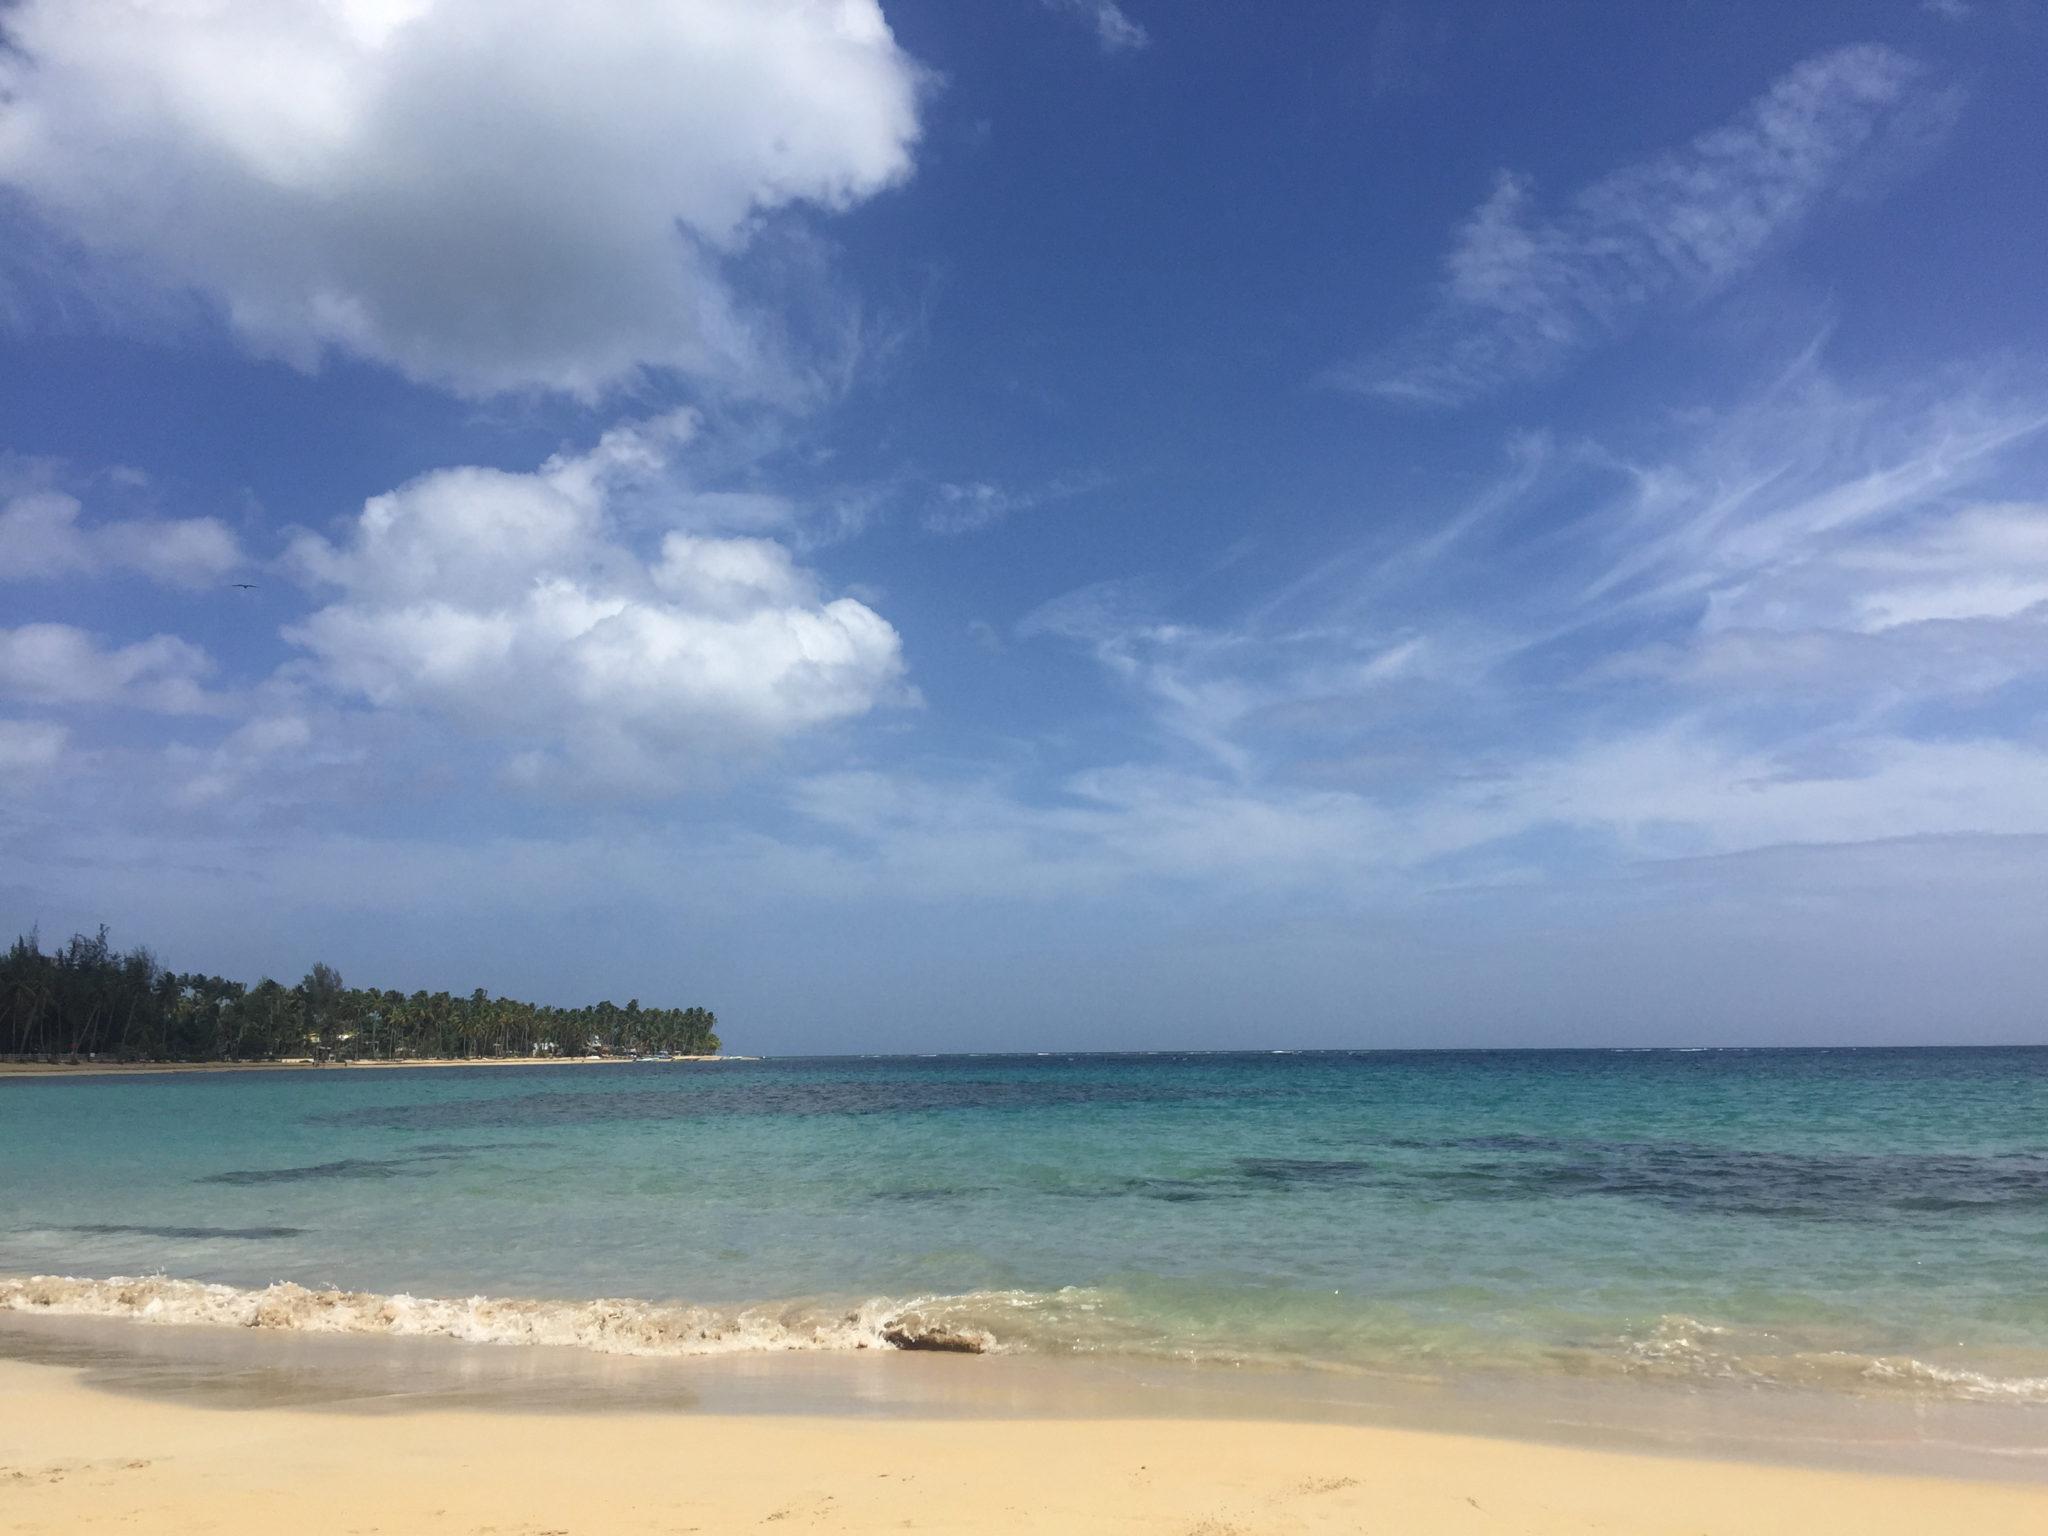 Hema_pose_ses_valises_republique_dominicaine_las_terrenas_plage_bleu_12